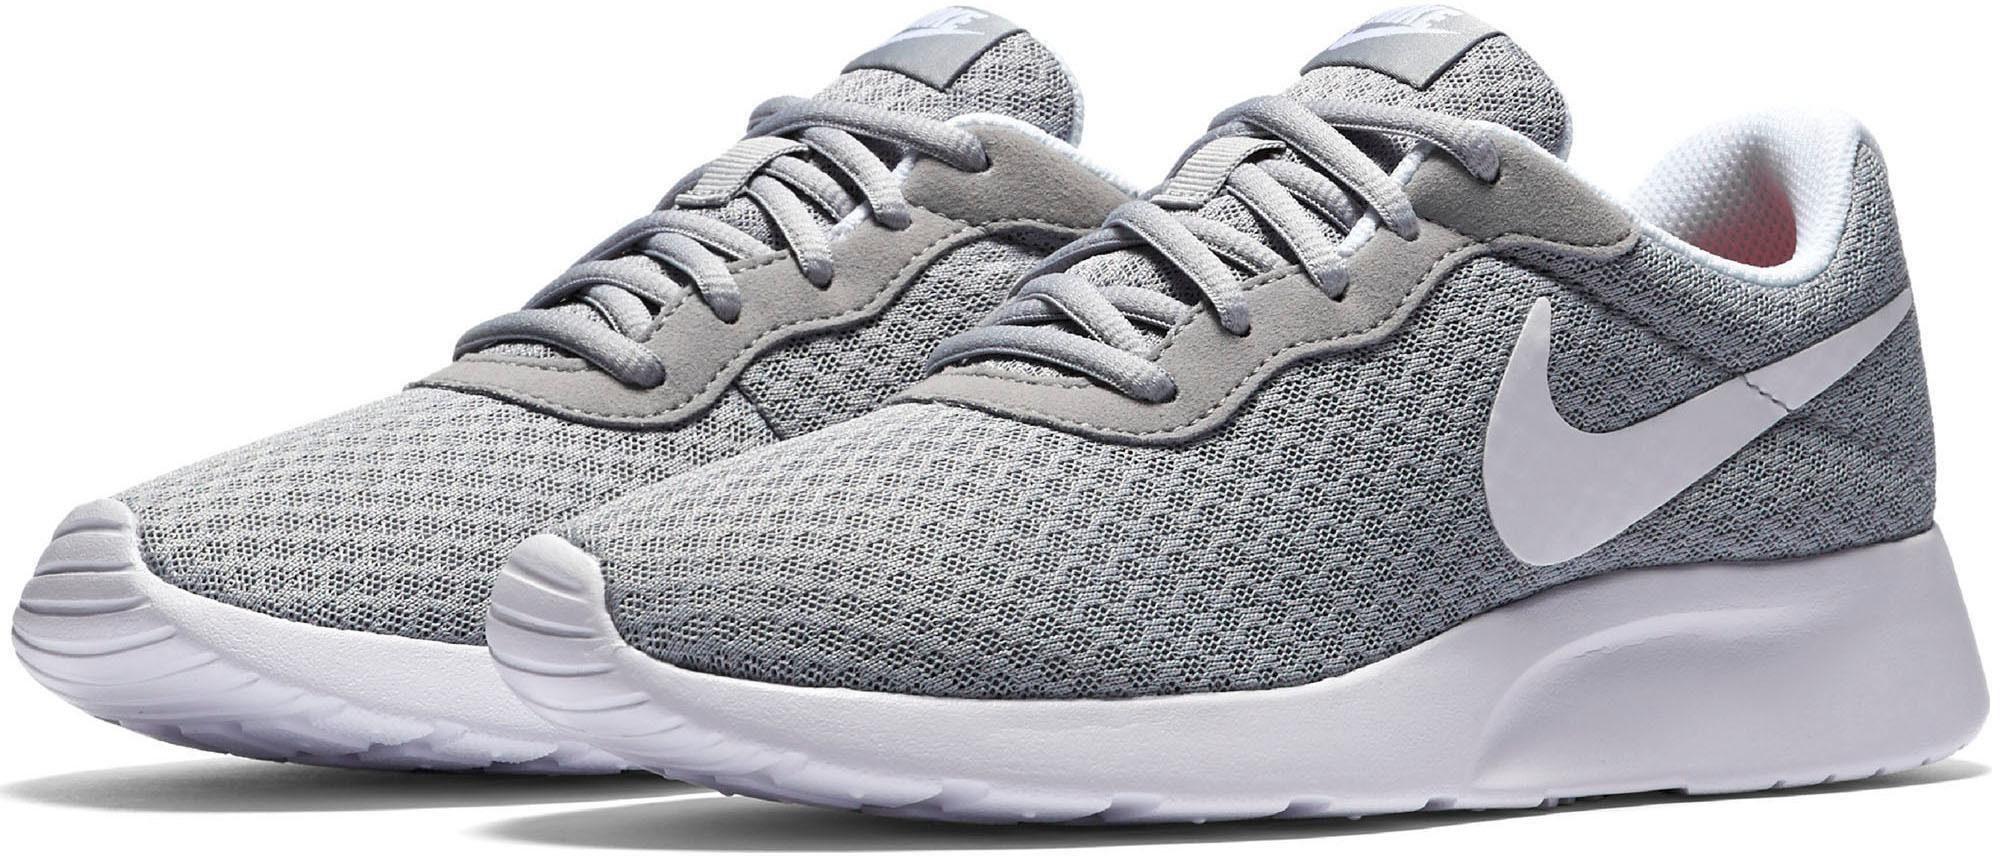 Sportswear SneakerStabiles Nike Obermaterial Wmns« Textil »tanjun qUzSpMV